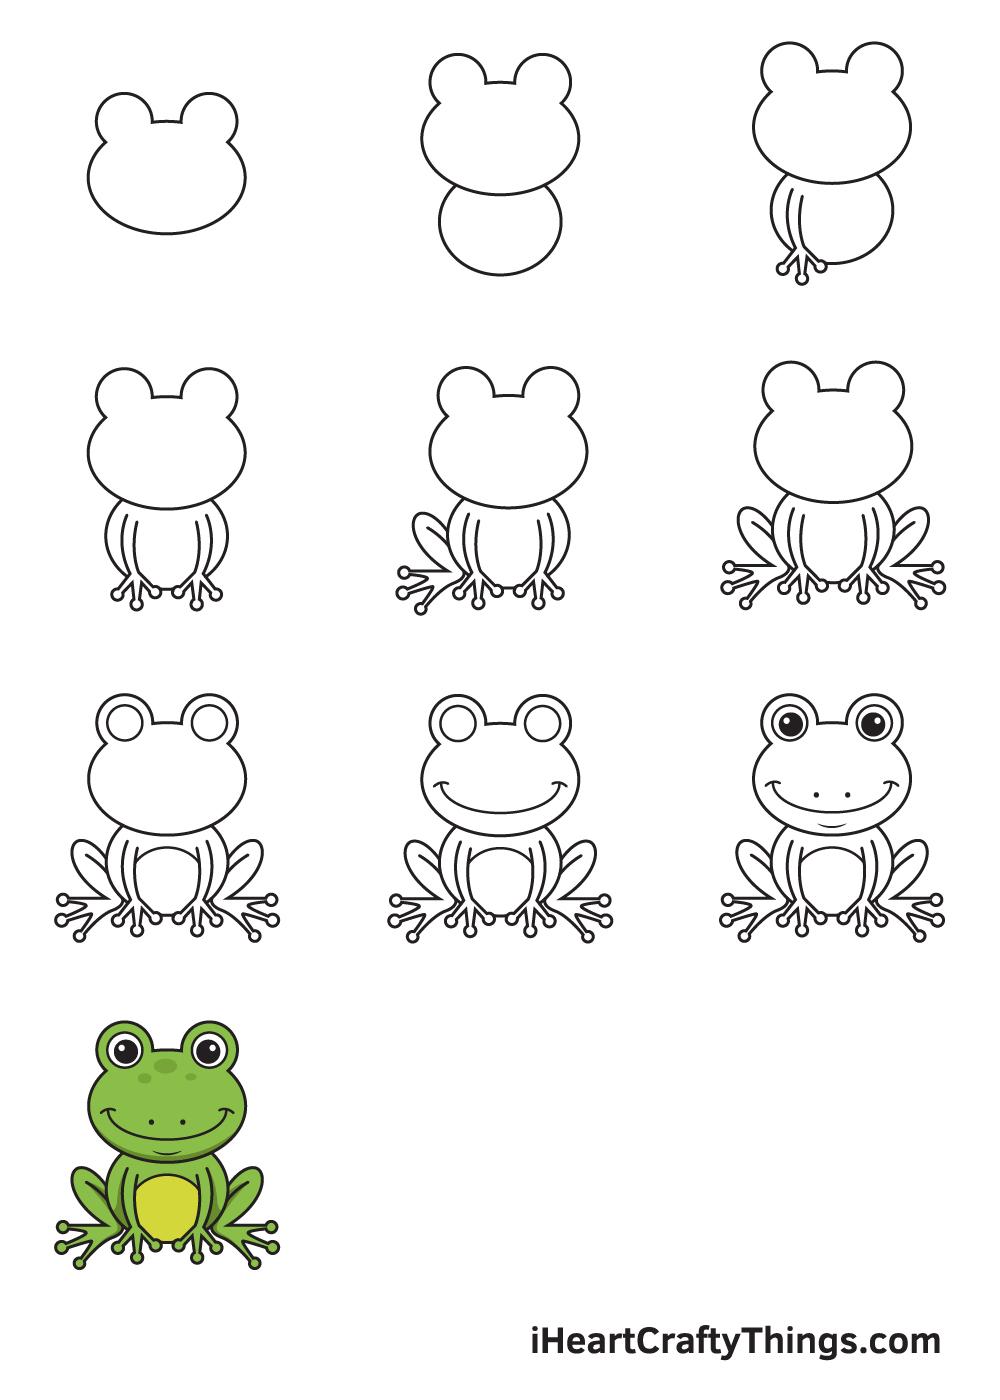 Drawing Frog in 9 Easy Steps